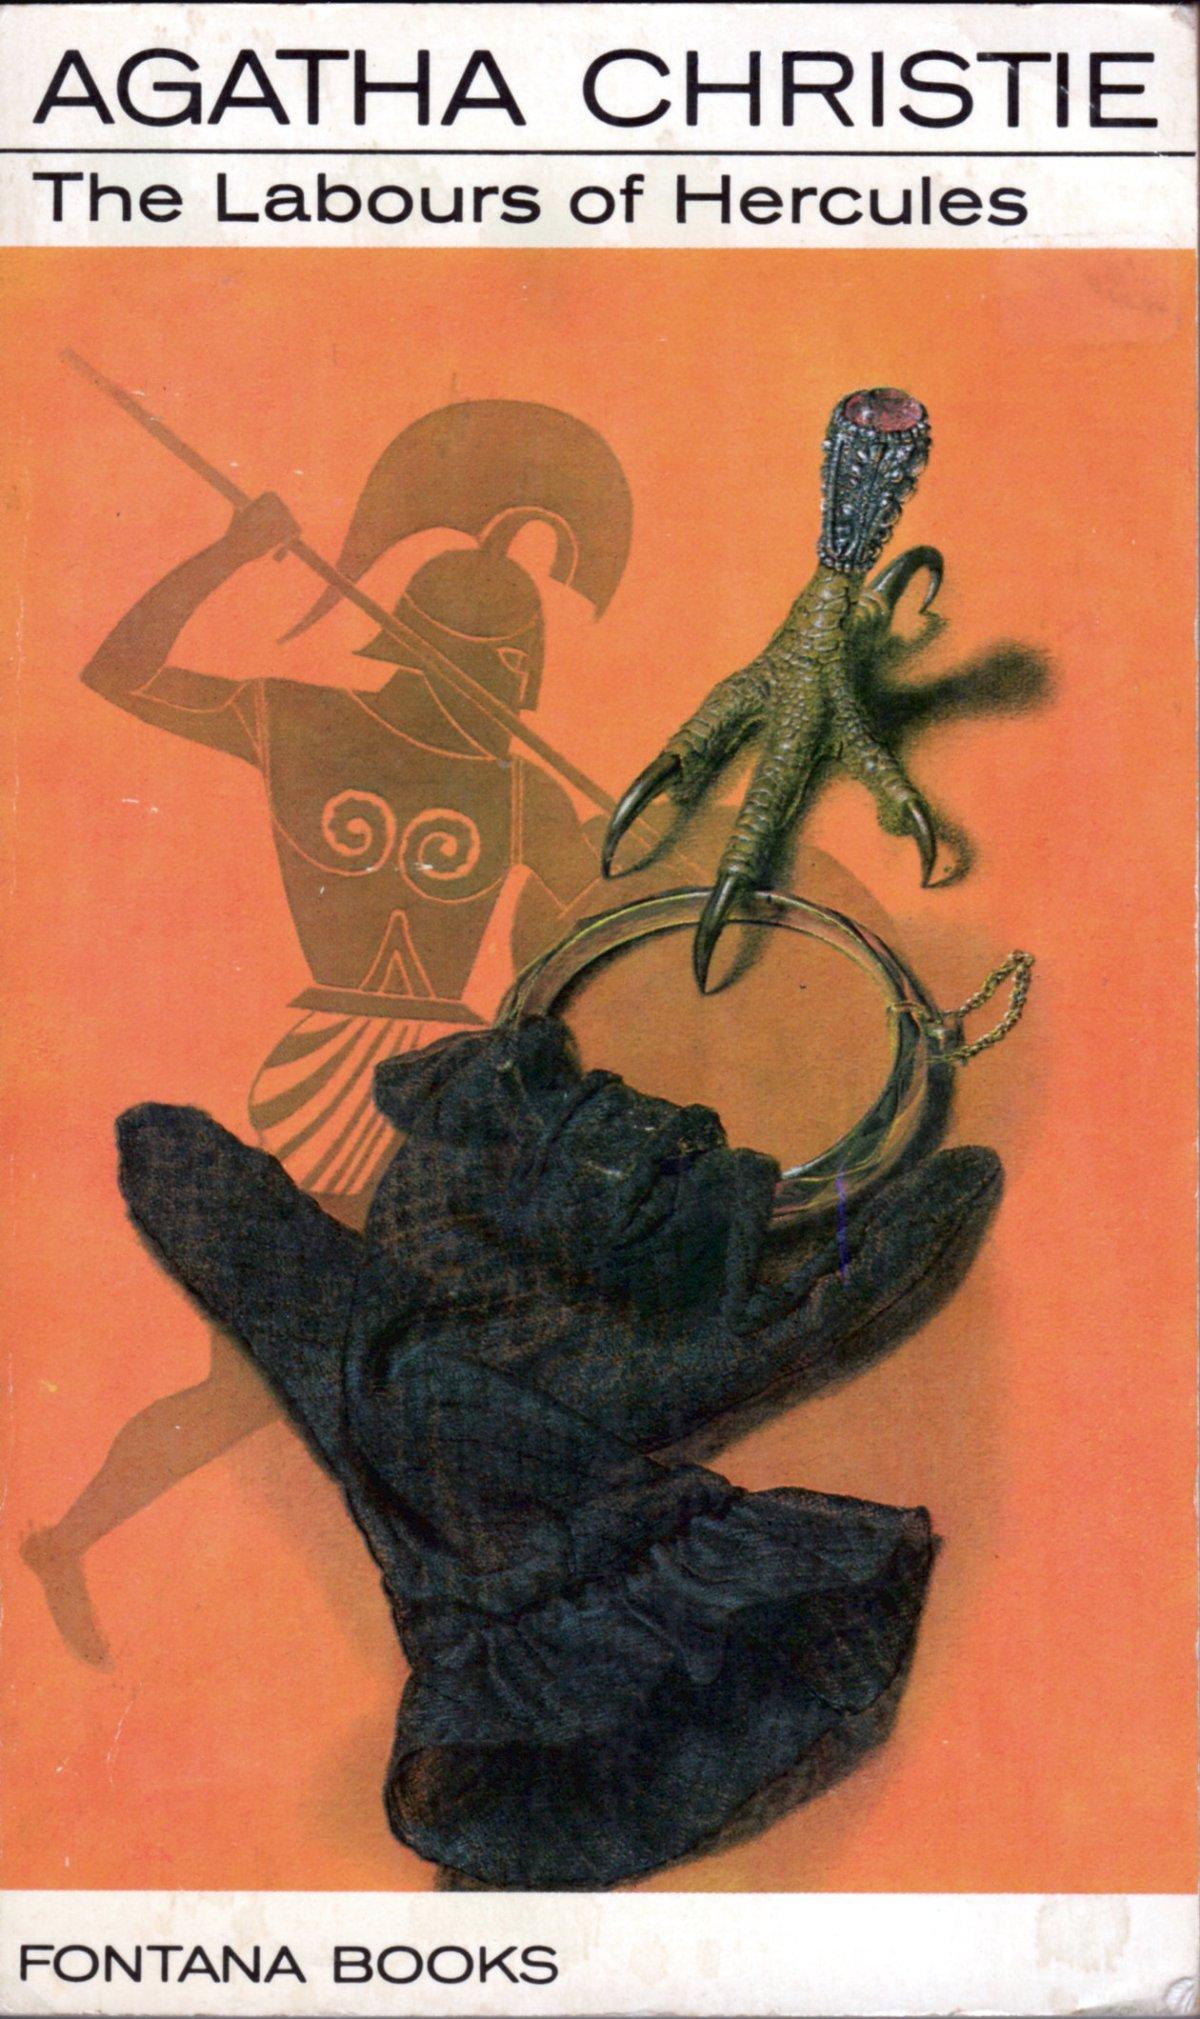 Agatha Christie Ian Robinson The Labours of Hercules 2 Fontana 1967